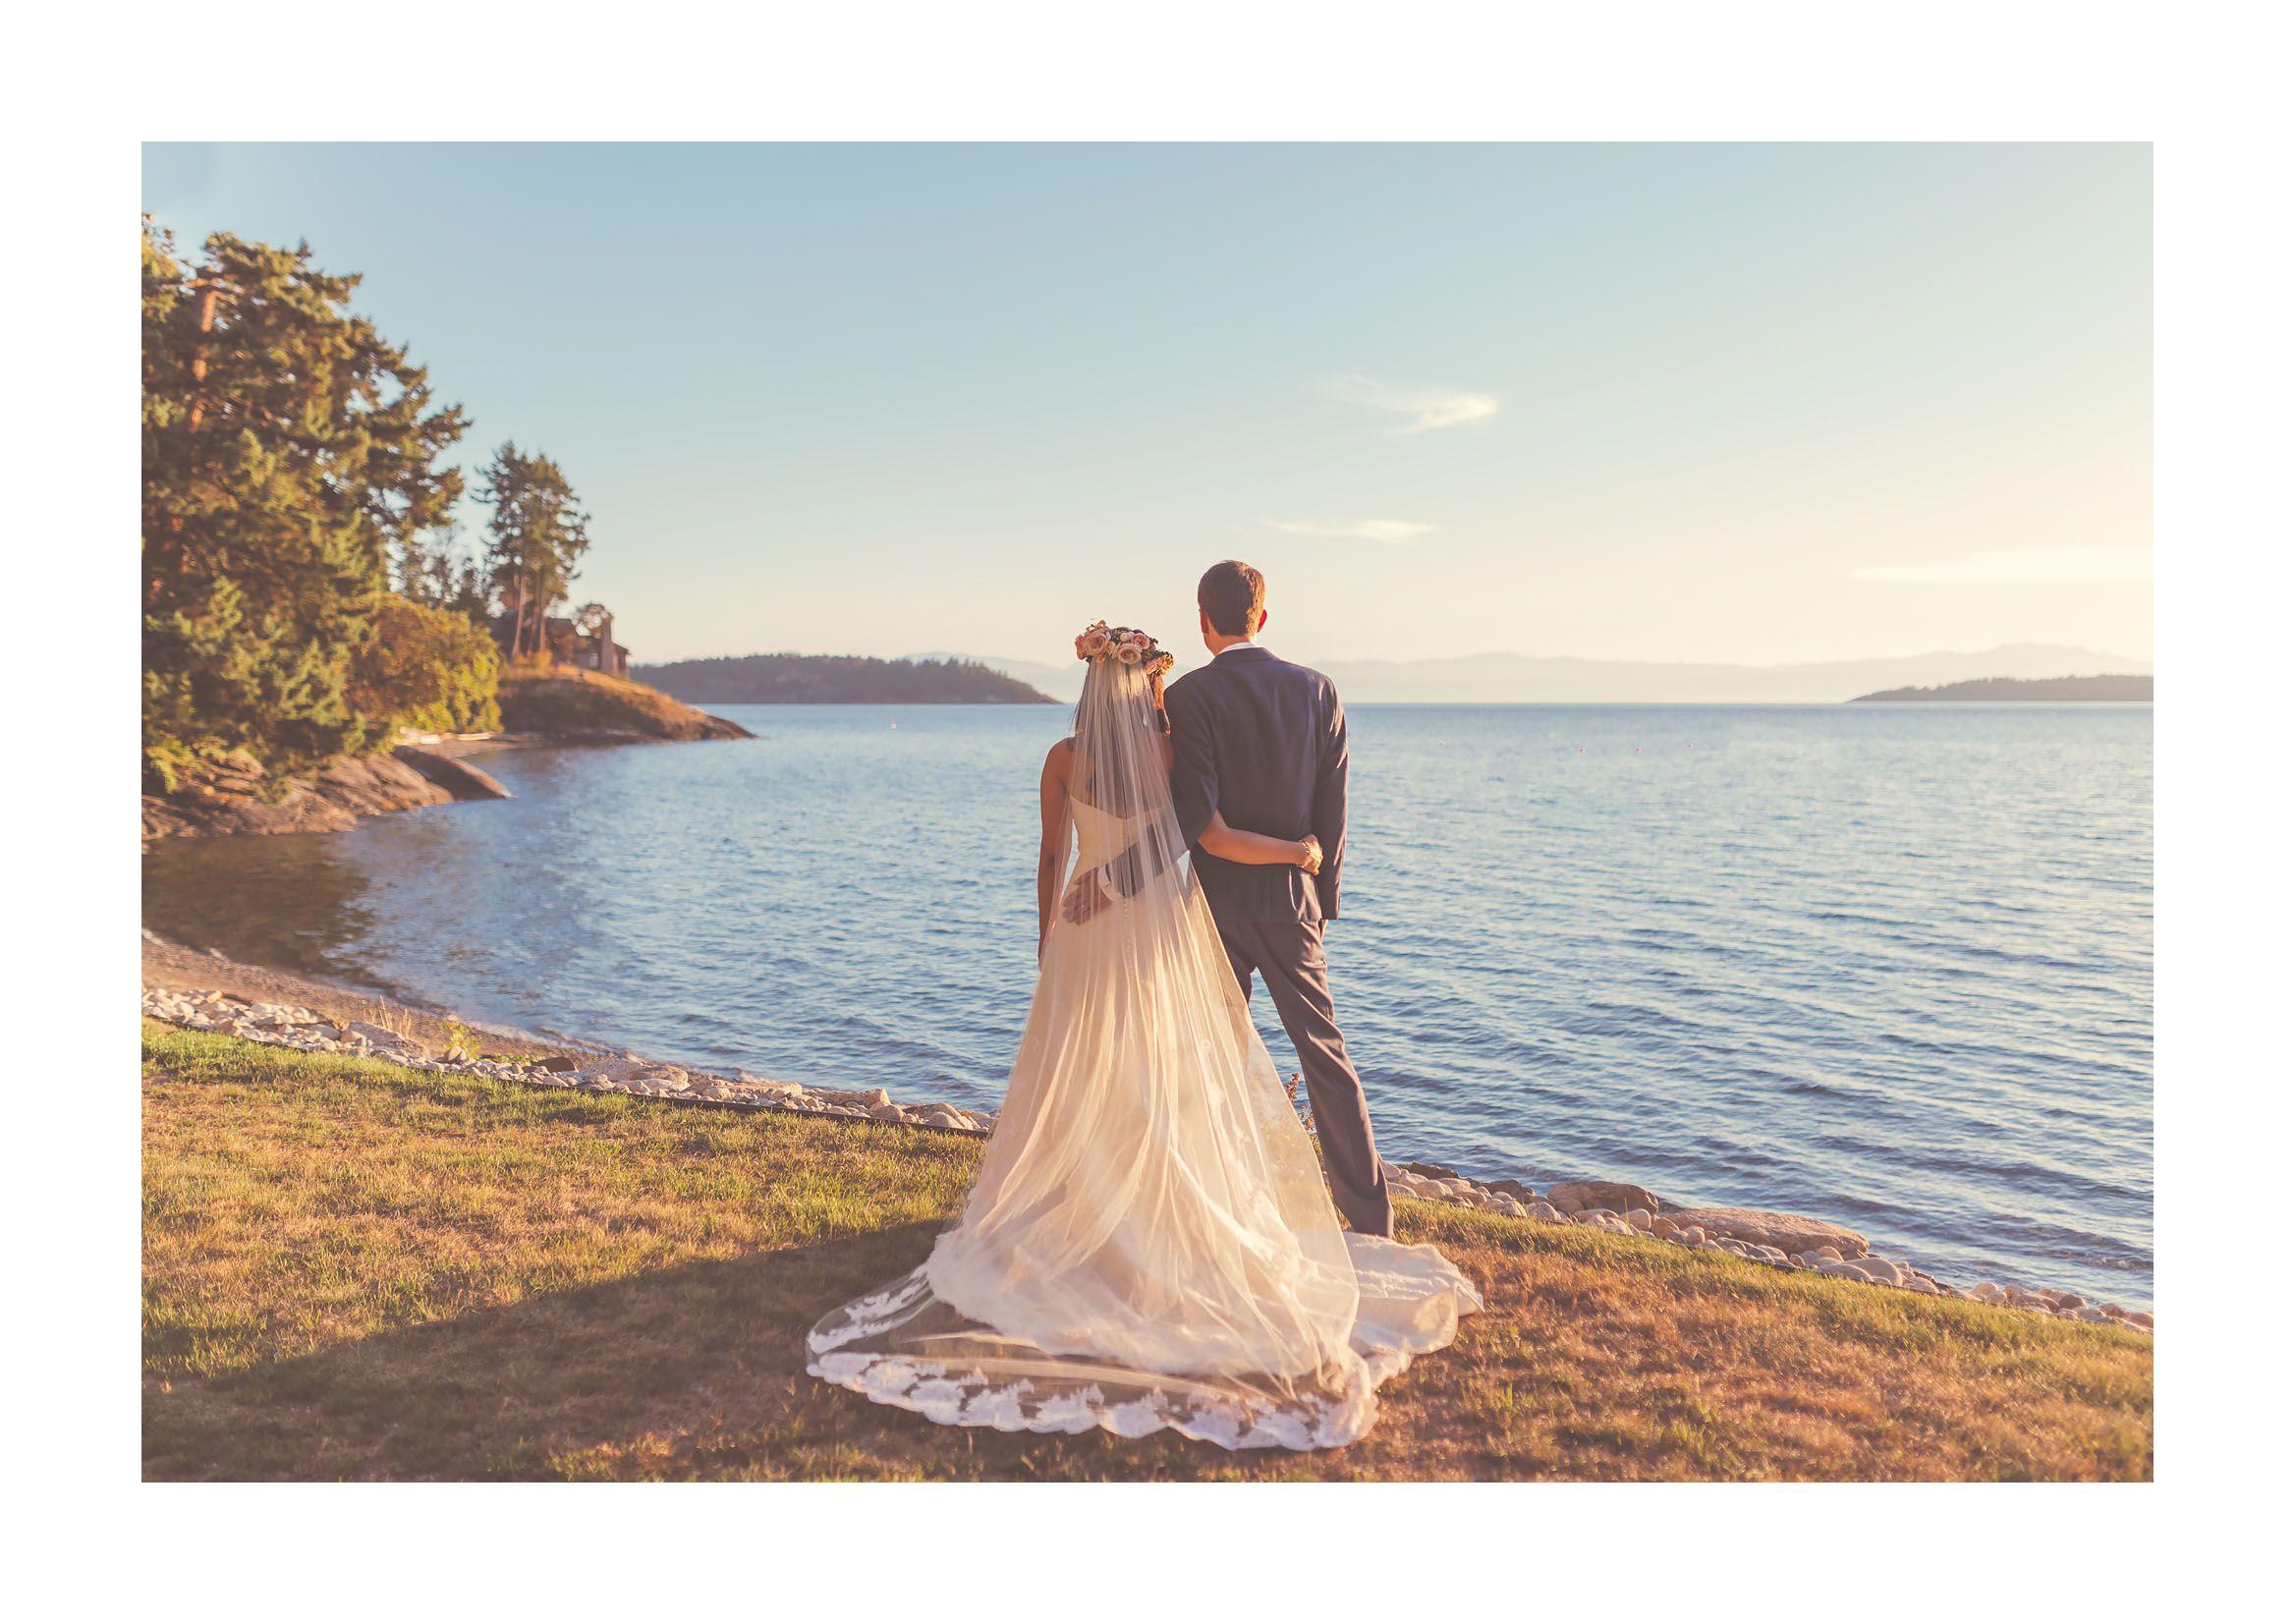 halfmoon bay beach wedding / sunshine coast, bc #jenniferpicardphotography #sunshinecoastbc #weddingvenue #dreamy #weddingdress #bouquet #westcoast #destinationwedding